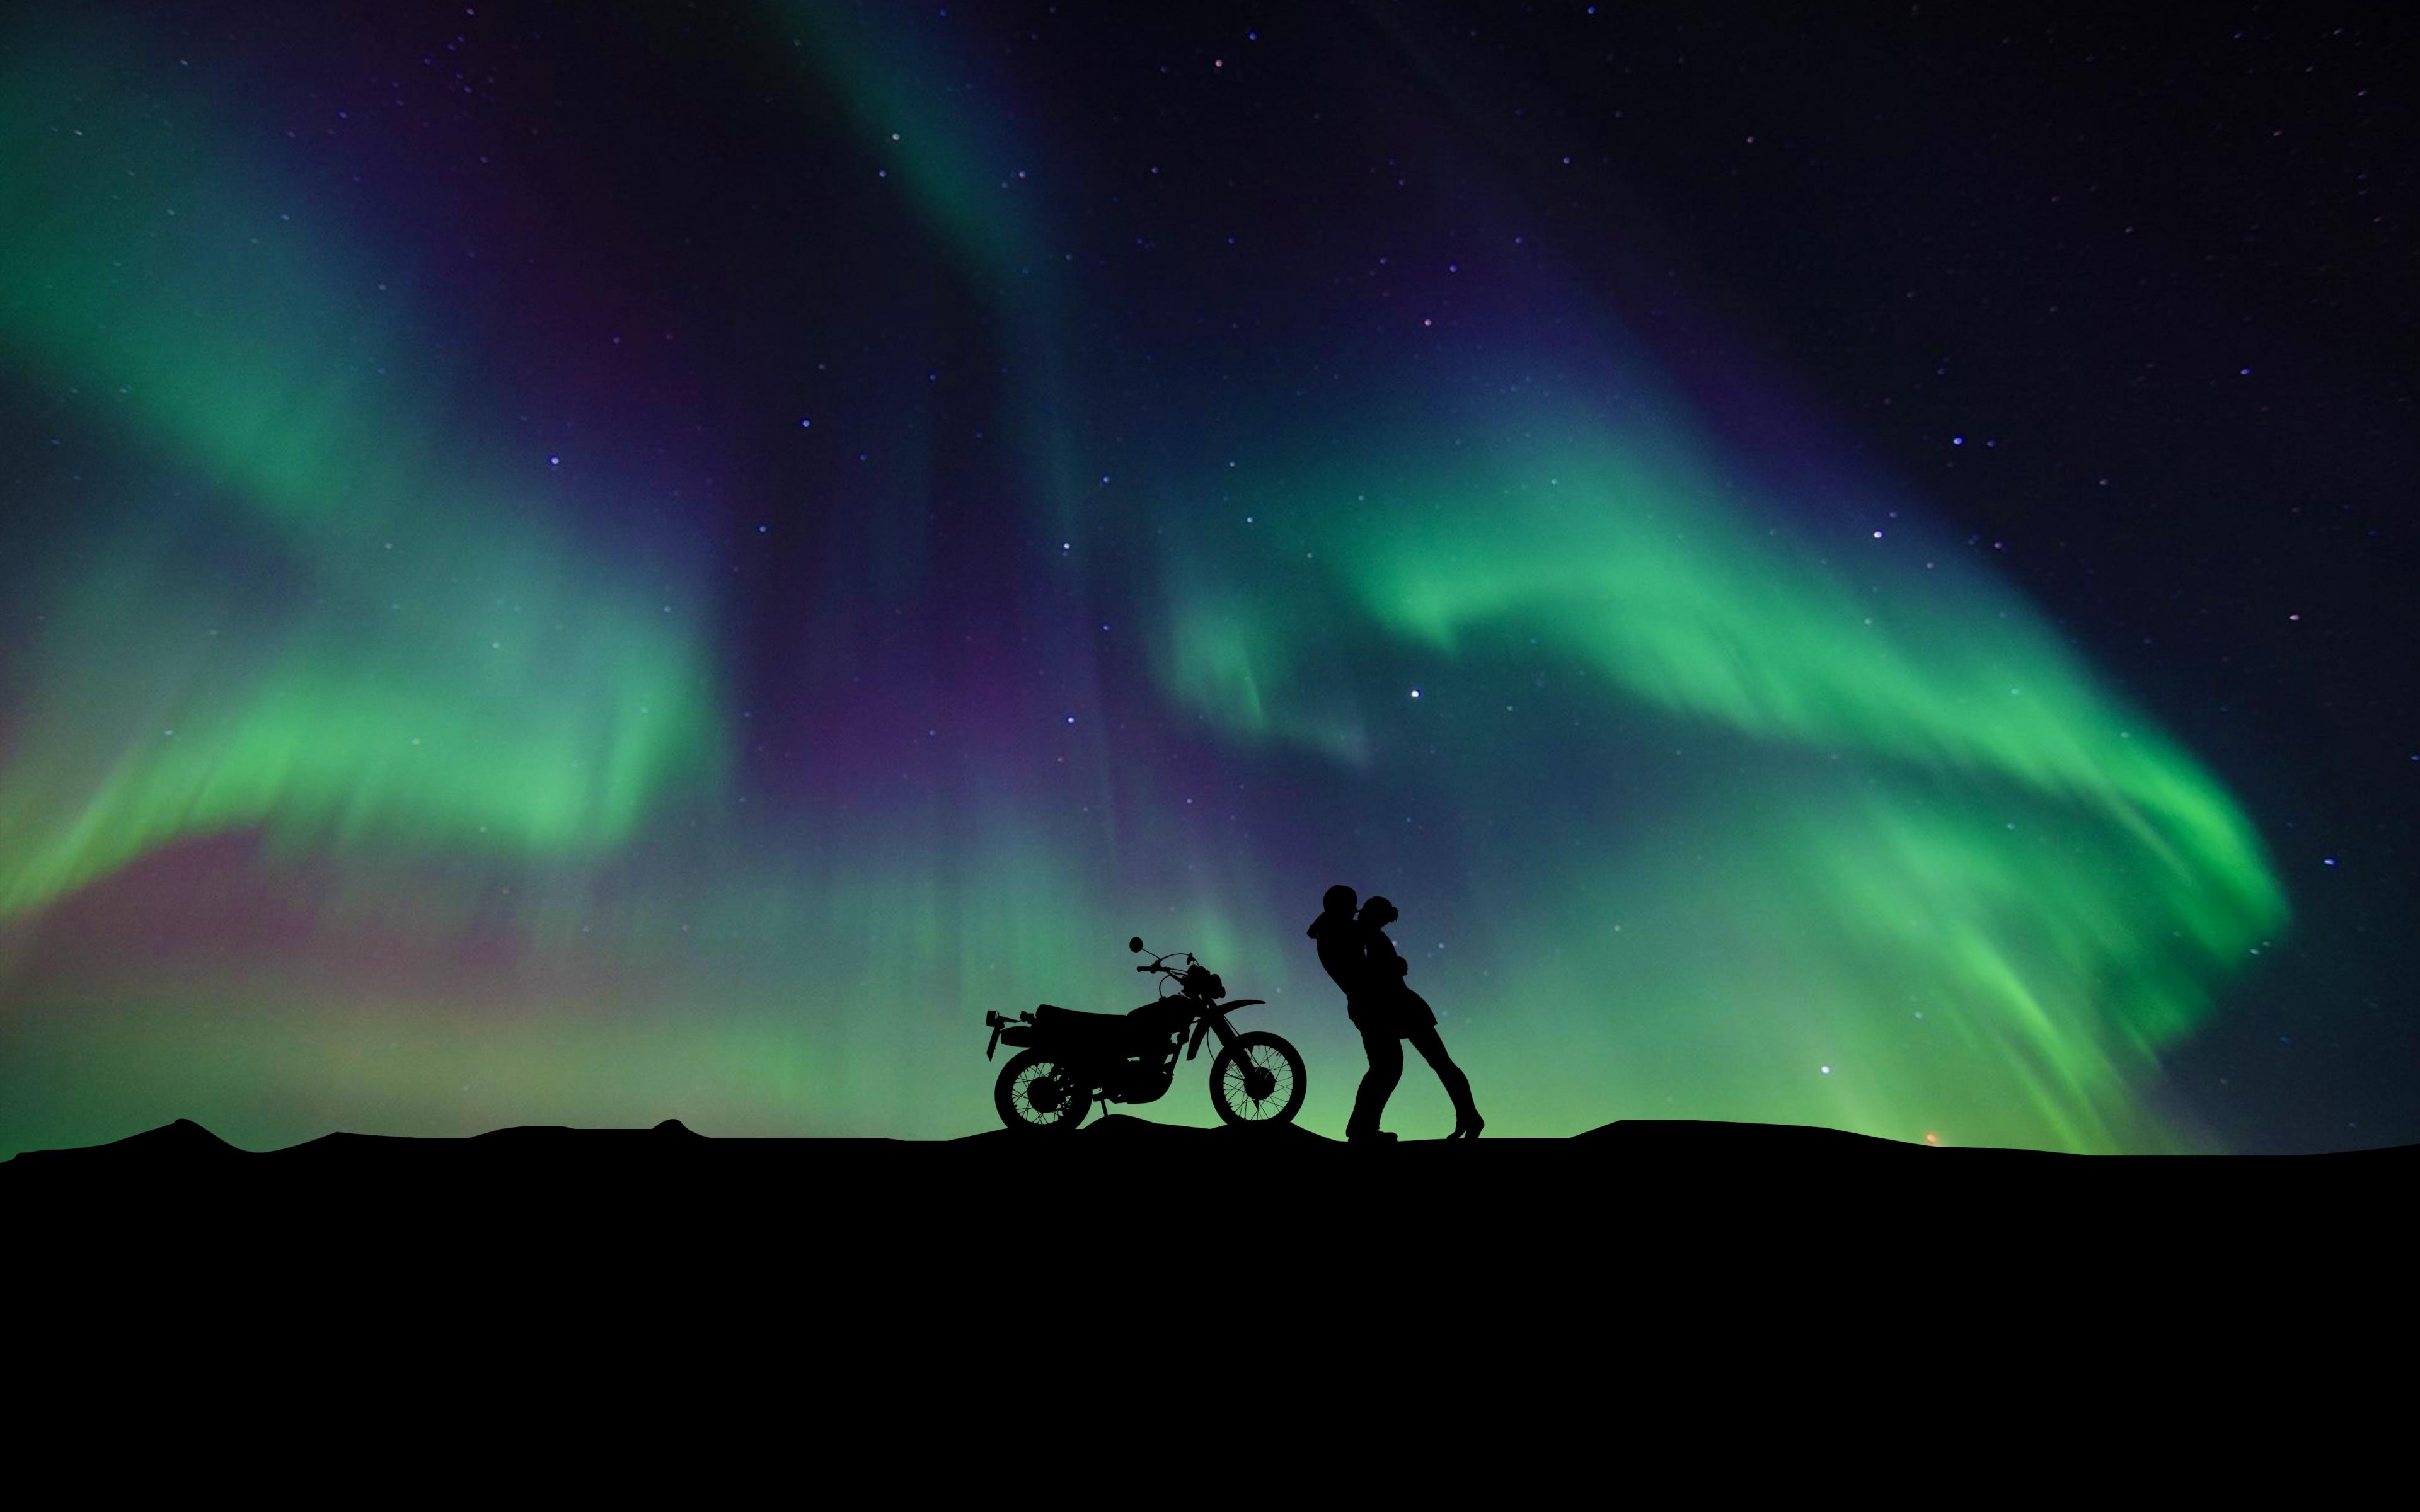 Download 3840x2400 Wallpaper Couple Aurora Borealis Motorcycle Hug 4k Ultra Hd 16 10 Widescreen 3840x2400 Hd Image Background 8075